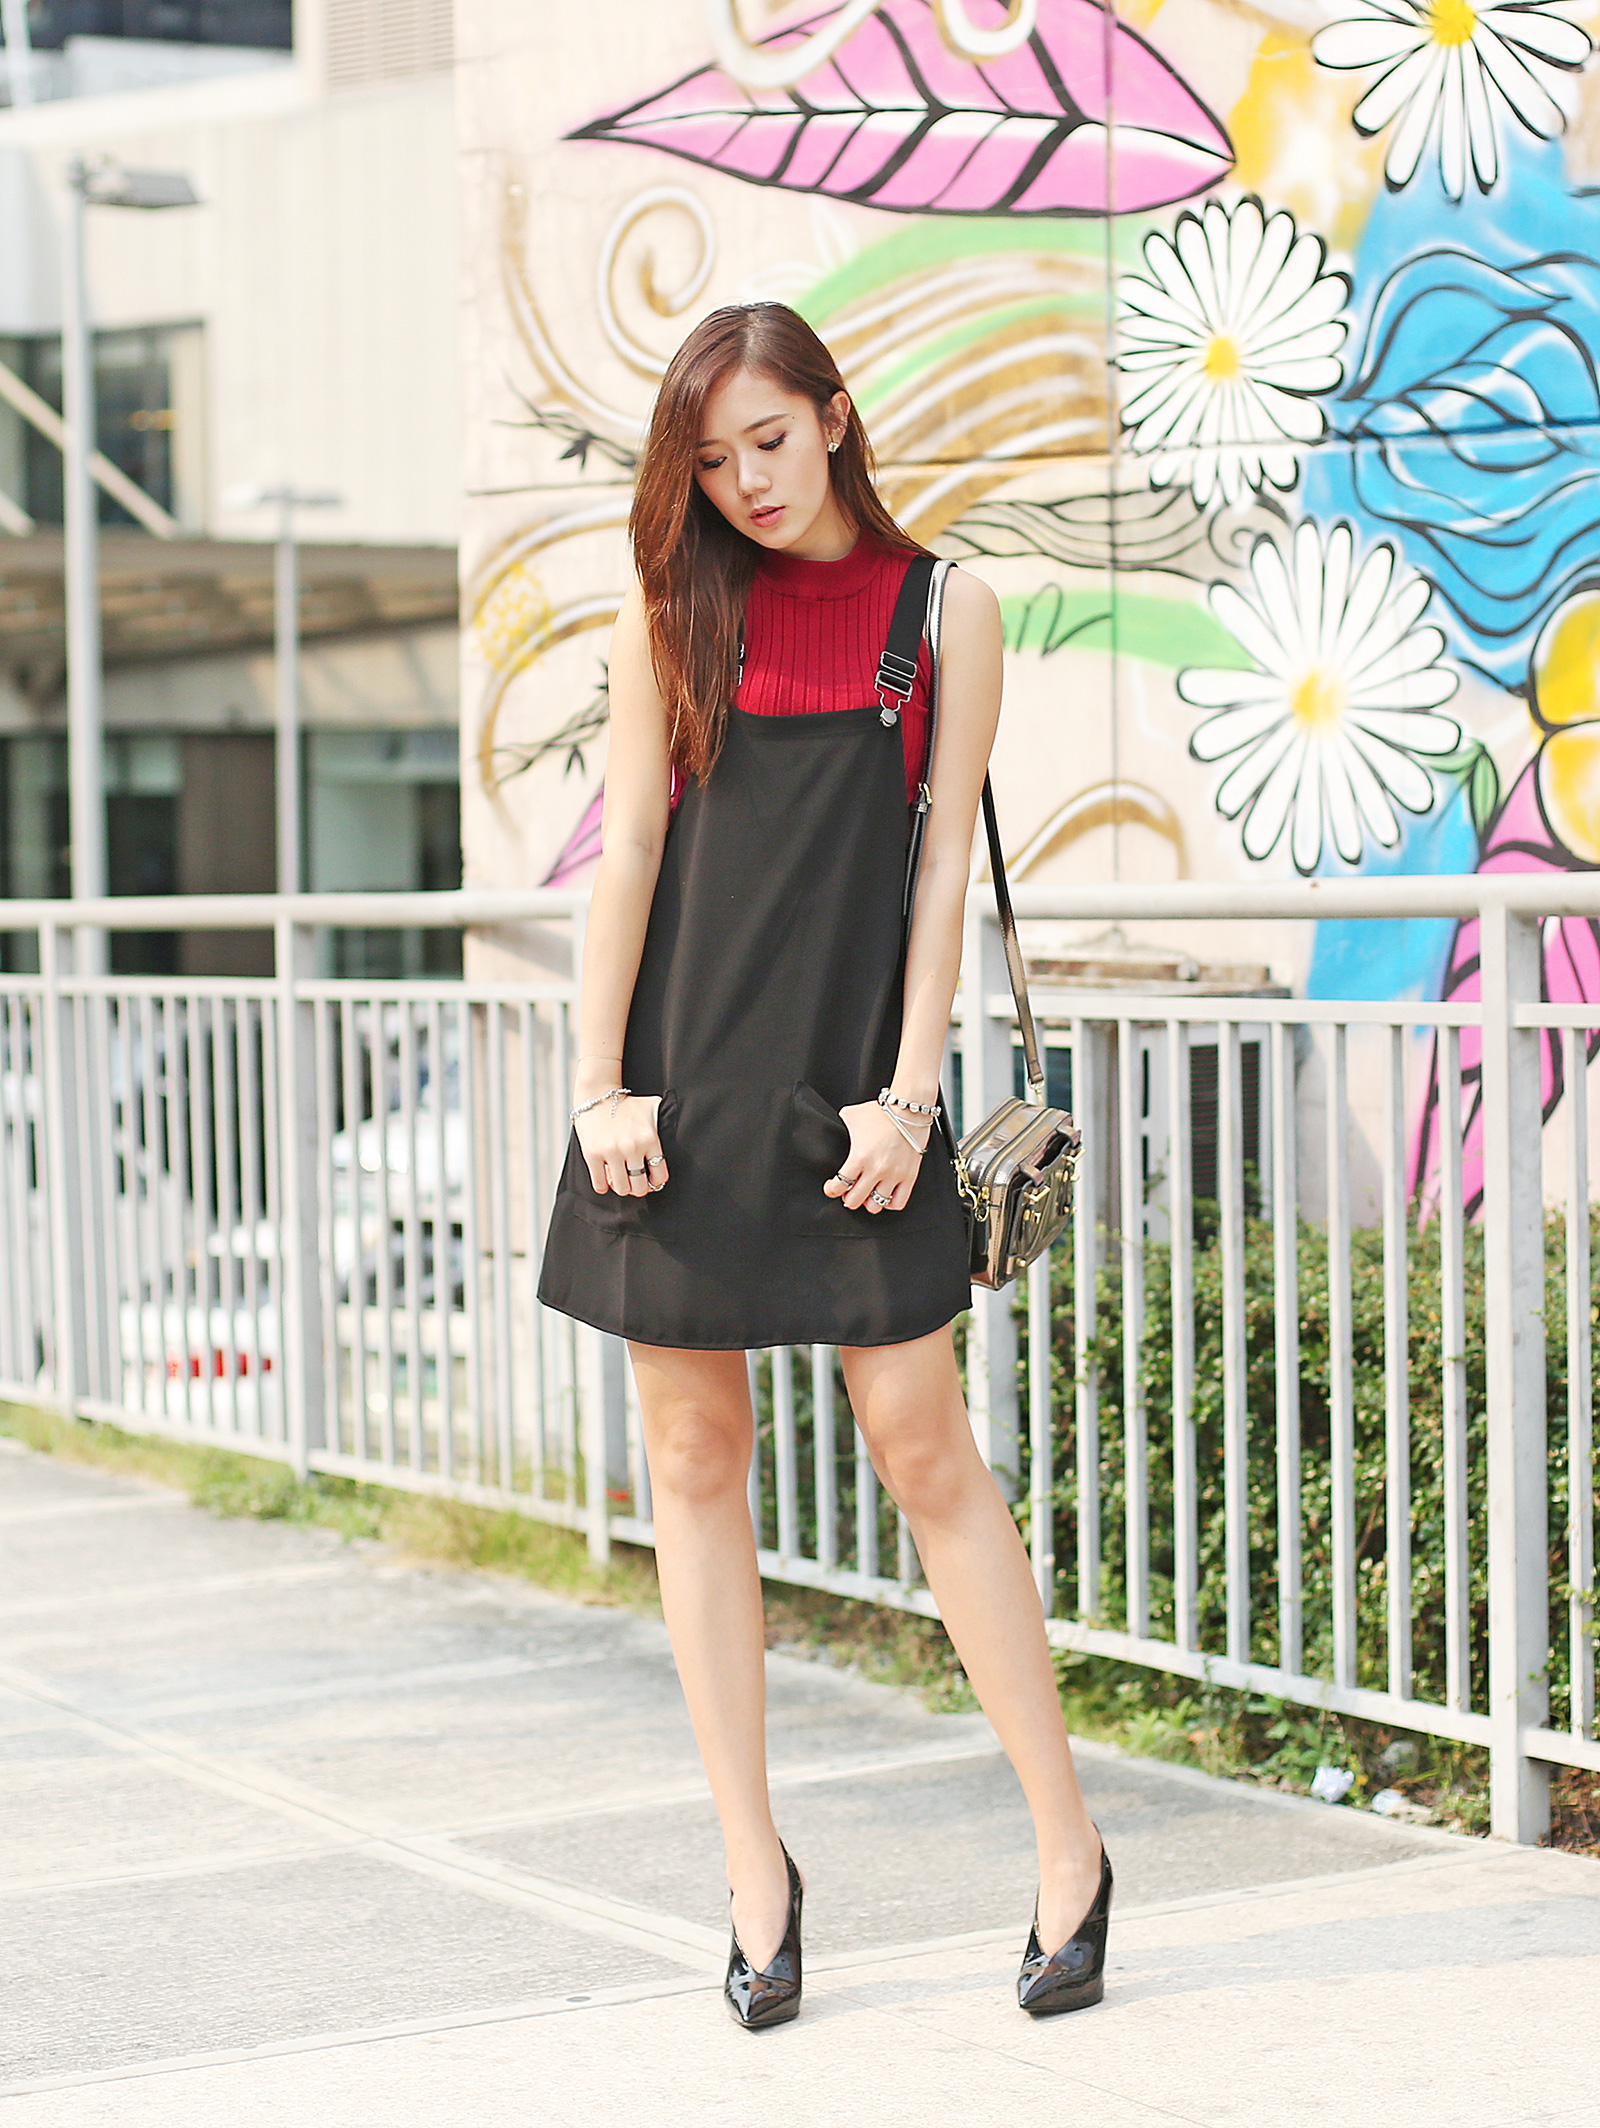 e91e22a0f59 Jumper Dress Fashion